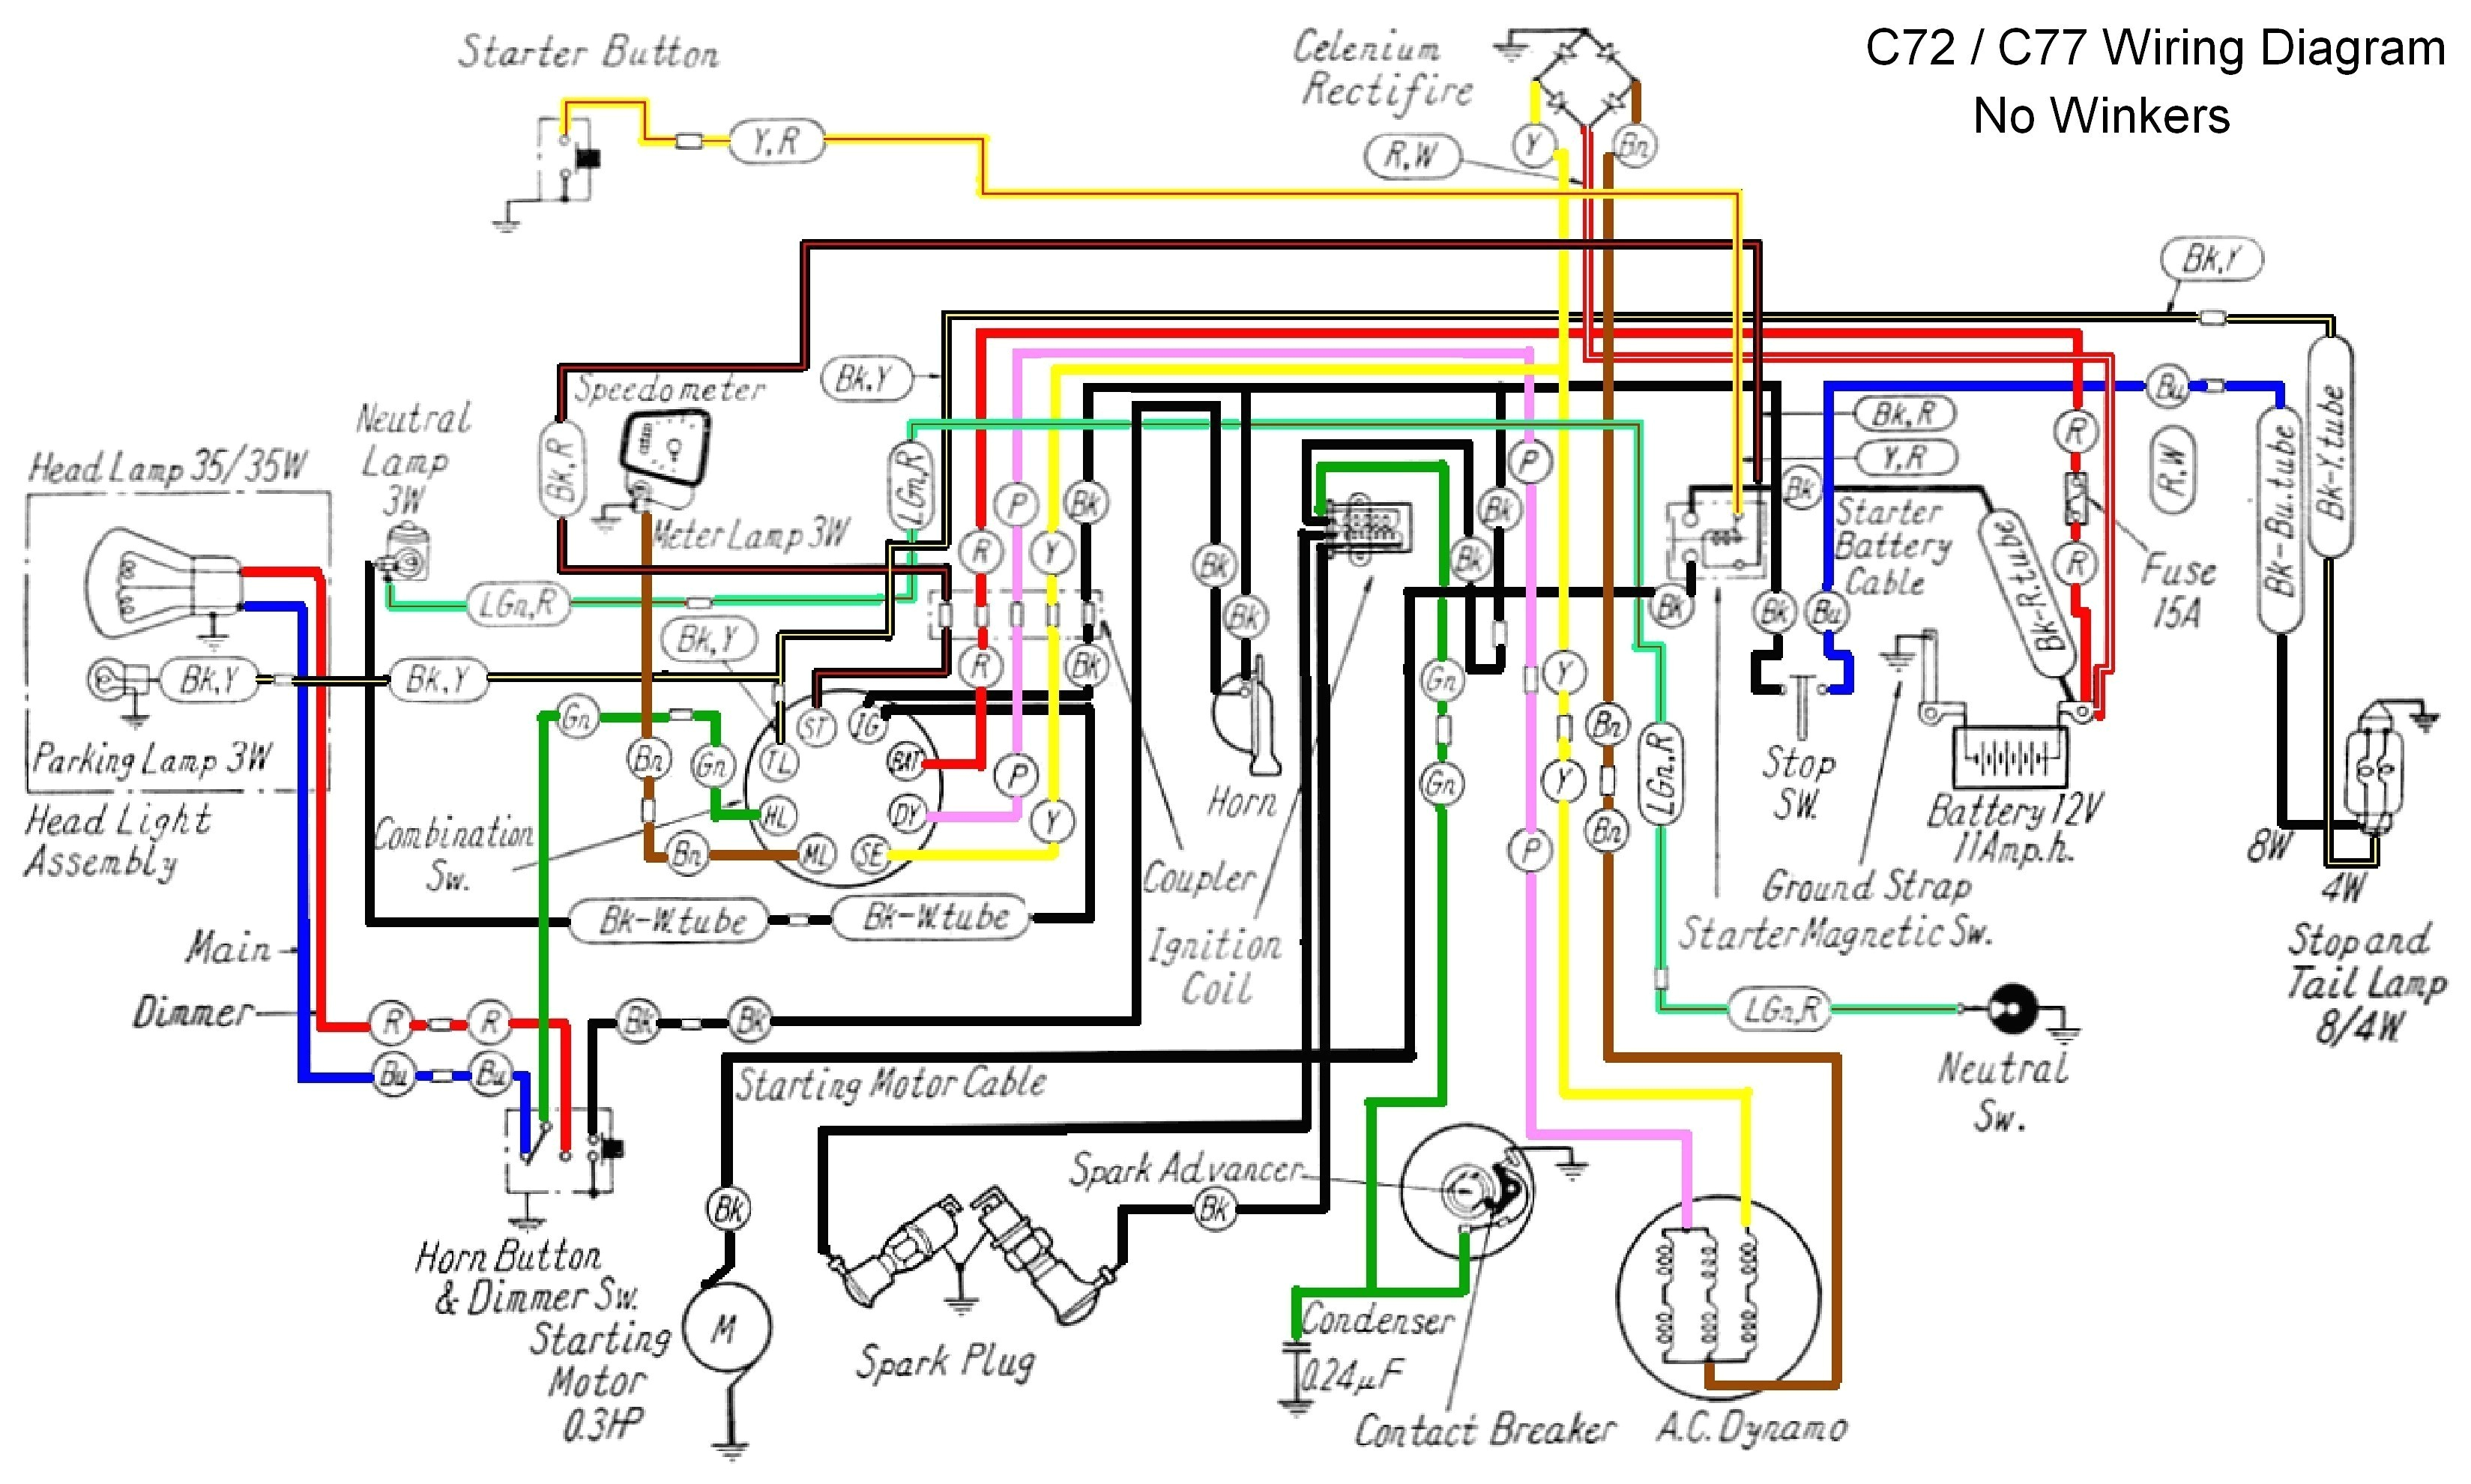 honda 70 wiring diagram wiring diagram bloghonda 70 wiring diagram wiring diagram het honda cf 70